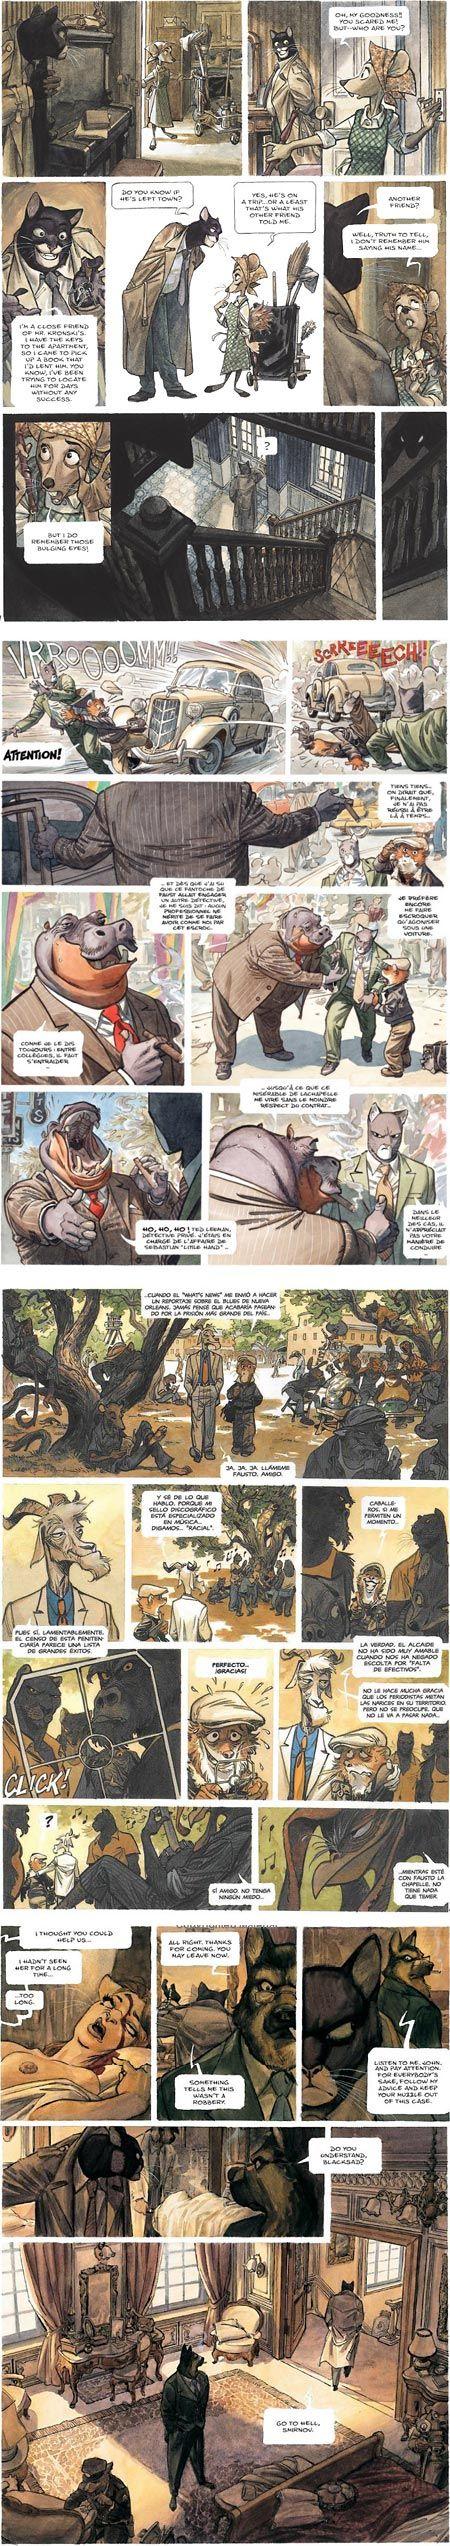 Blacksad (Juanjo Guarnido) -  stunning comic art, wonderfully realized characters, and beautifully rendered backgrounds and settings.